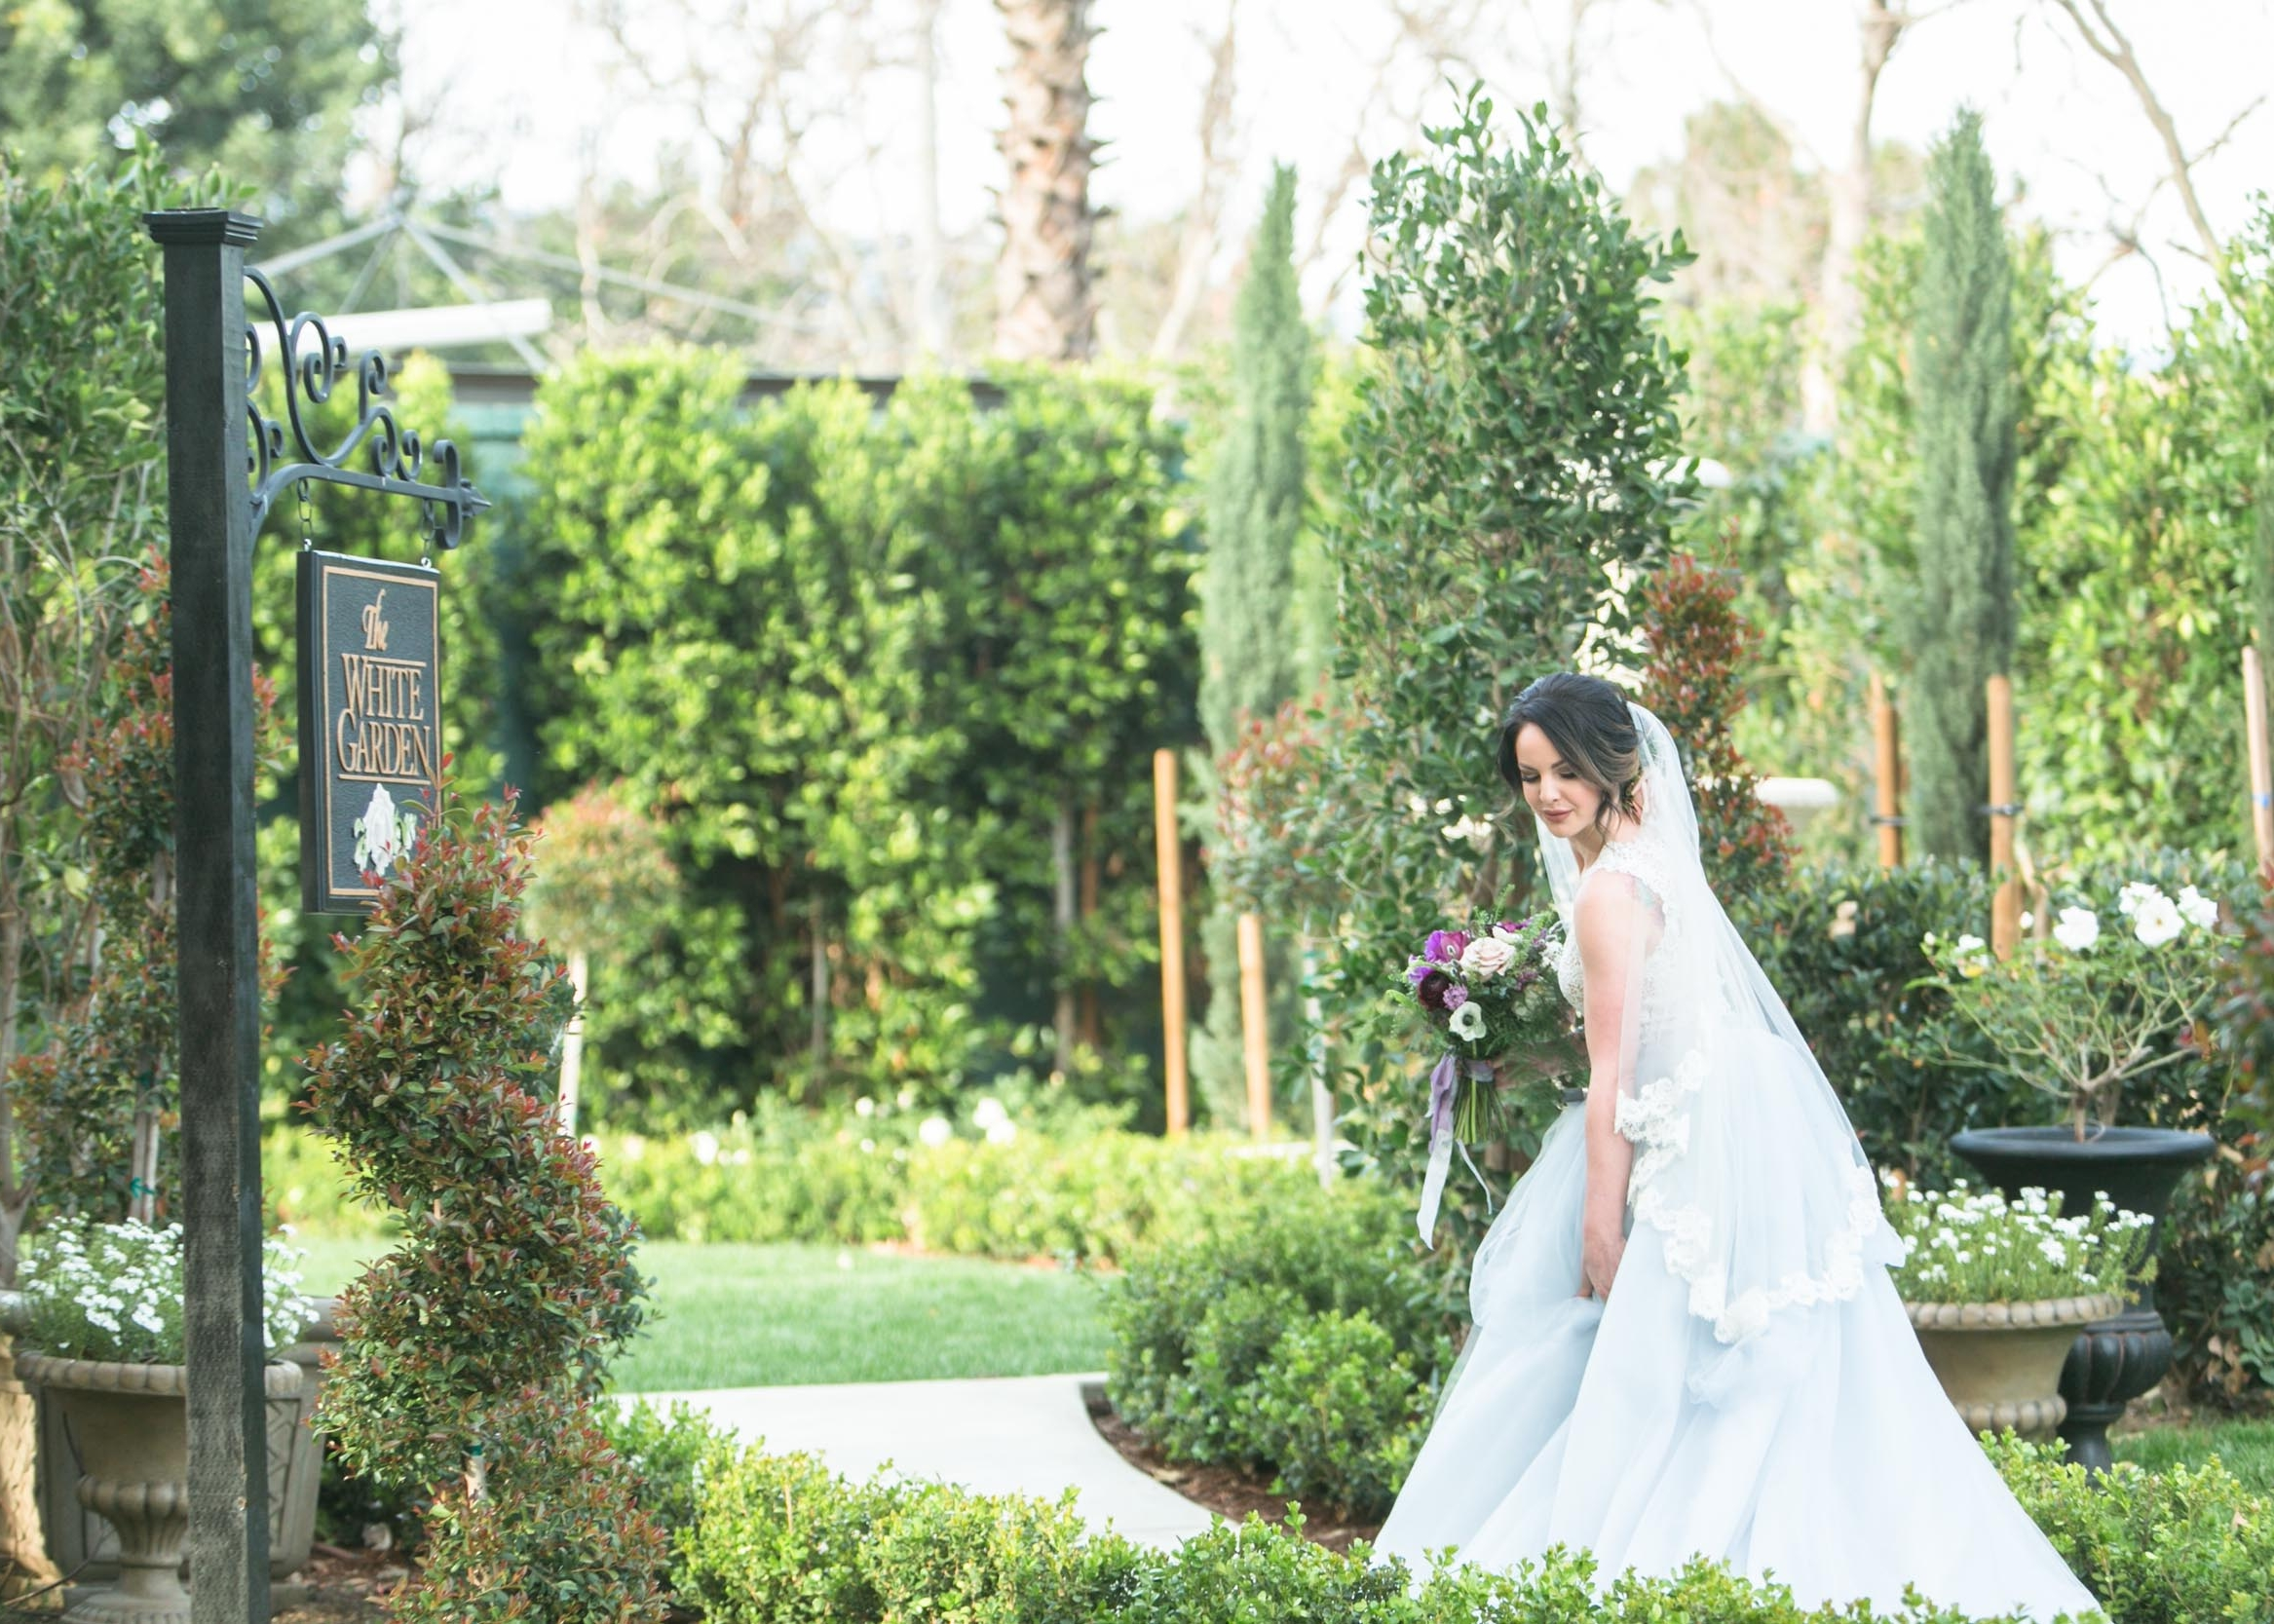 christmas-house-wedding-venue-white-garden-bridal-portraits-carrie-vines-056.jpg